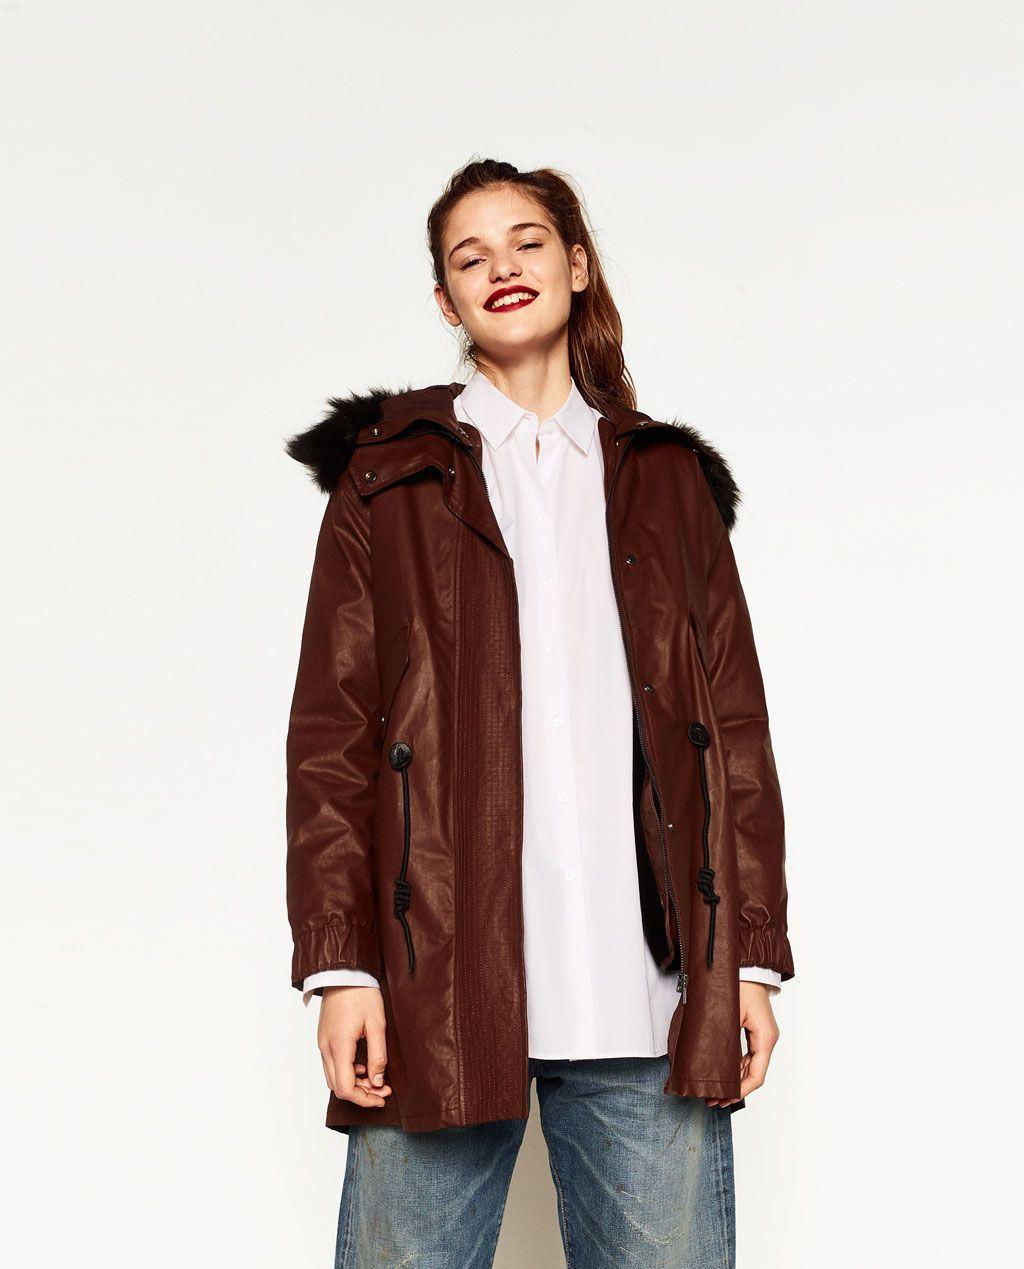 Zara manteau a capuche fourrure